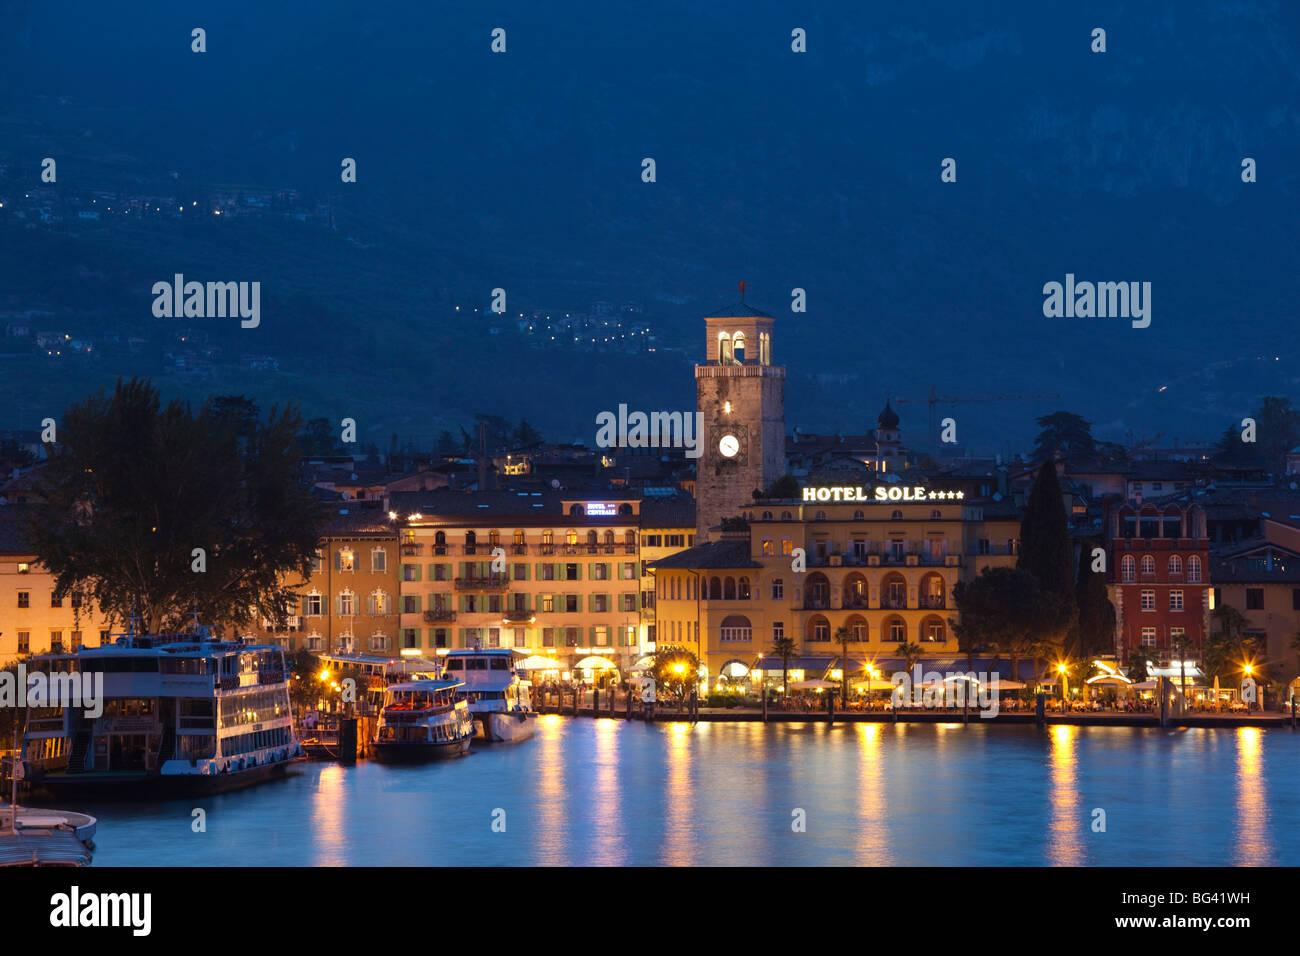 Italy, Trentino-Alto Adige, Lake District, Lake Garda, Riva del Garda, town view with Torre Apponale, 13th century - Stock Image